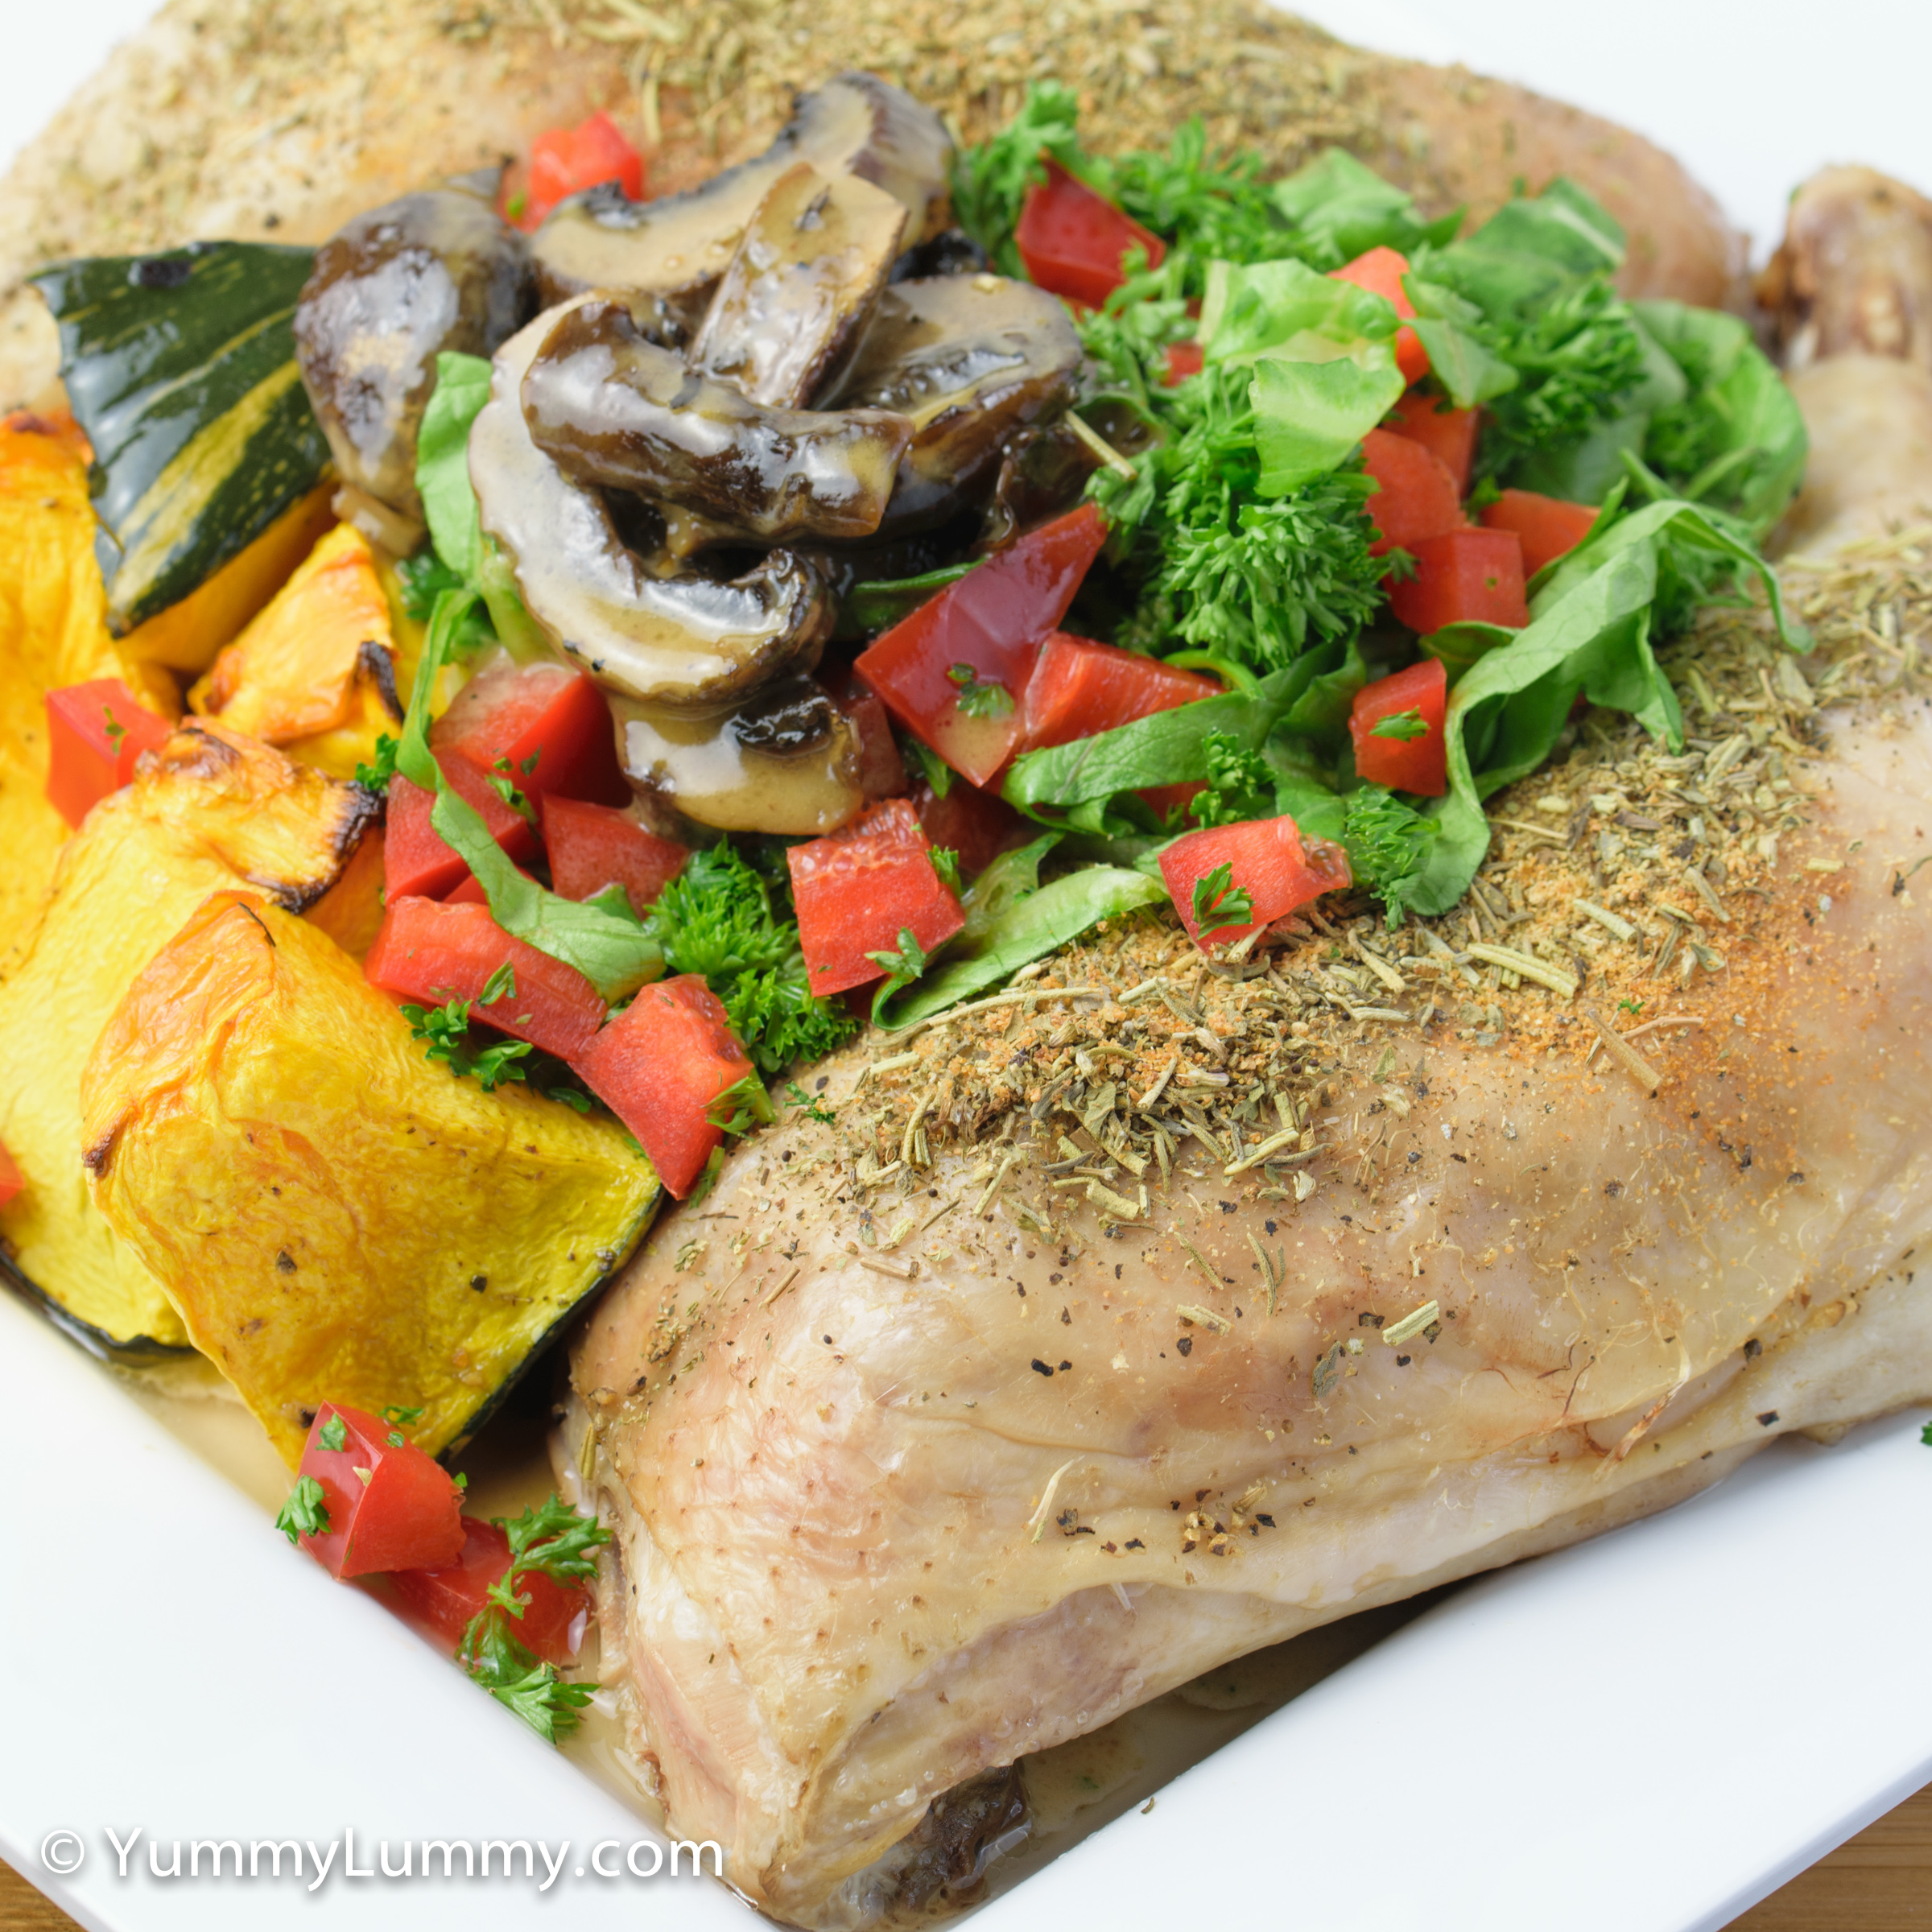 Tuesday night dinner. Roast Chicken Maryland with pumpkin and mushrooms.